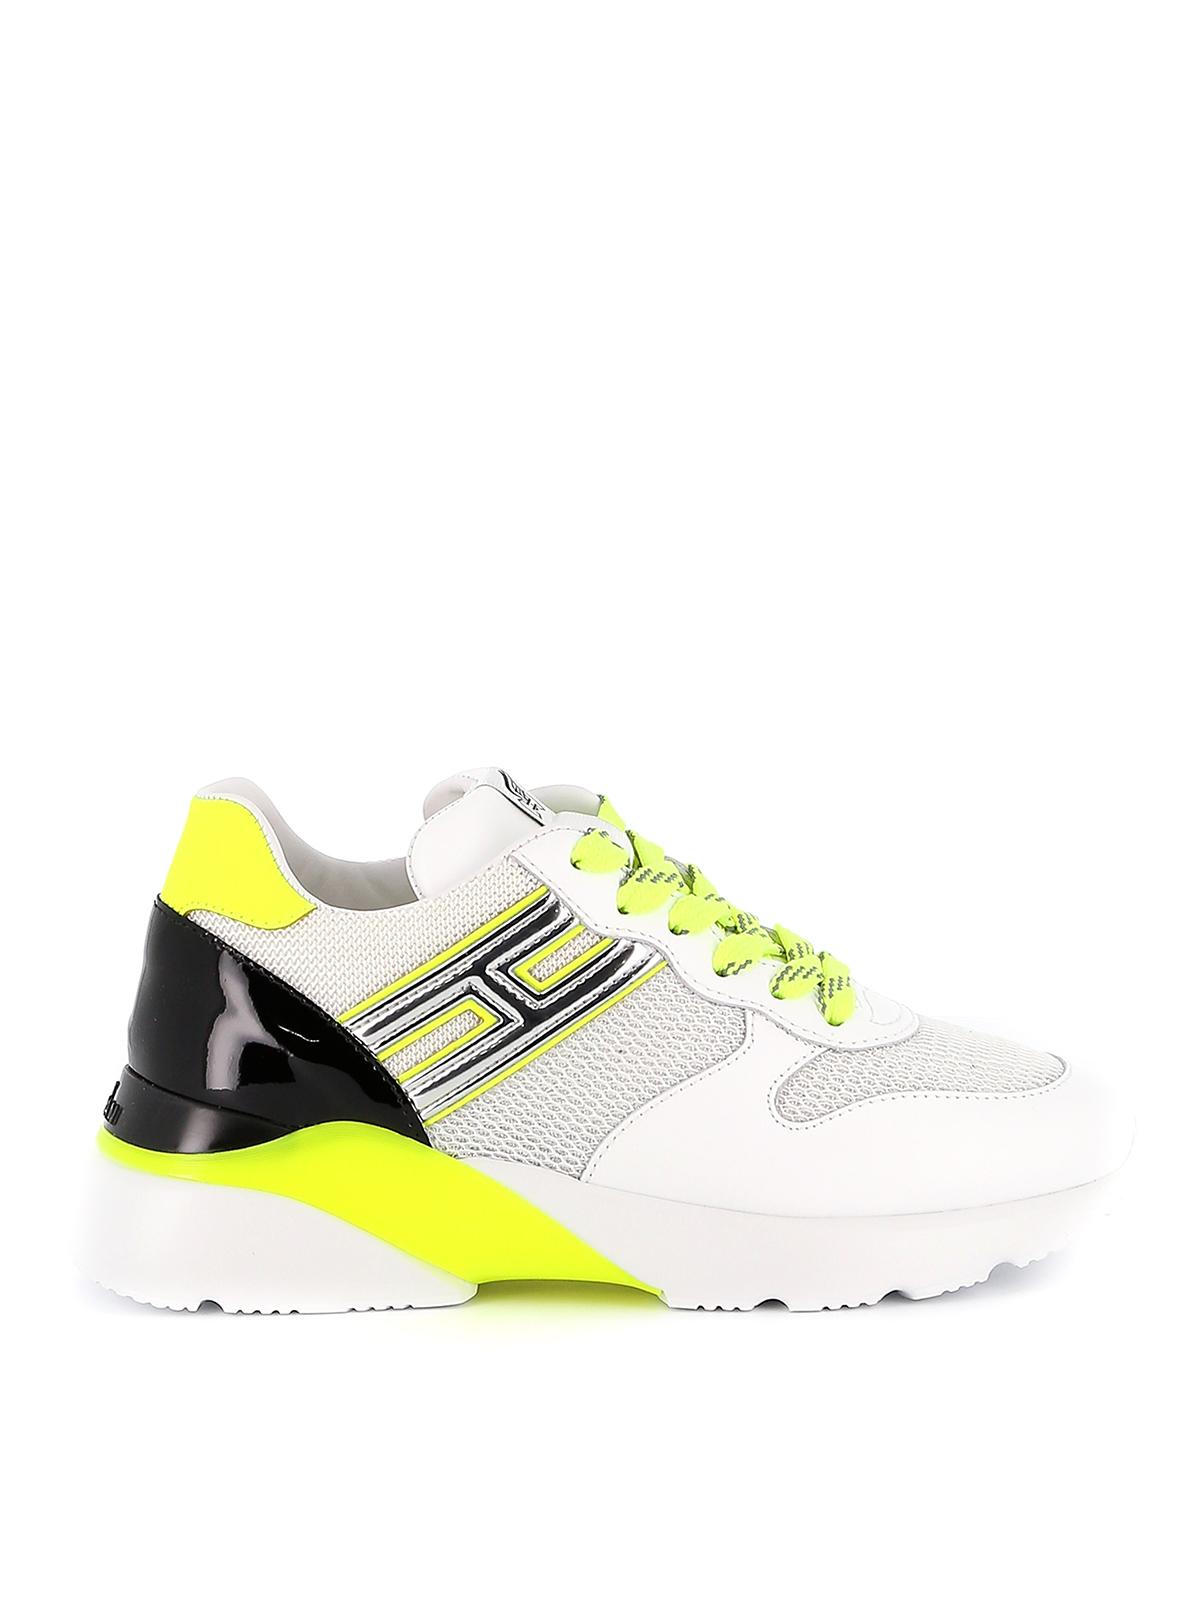 Sneakers Hogan - Sneaker Active One con dettagli fluo ...